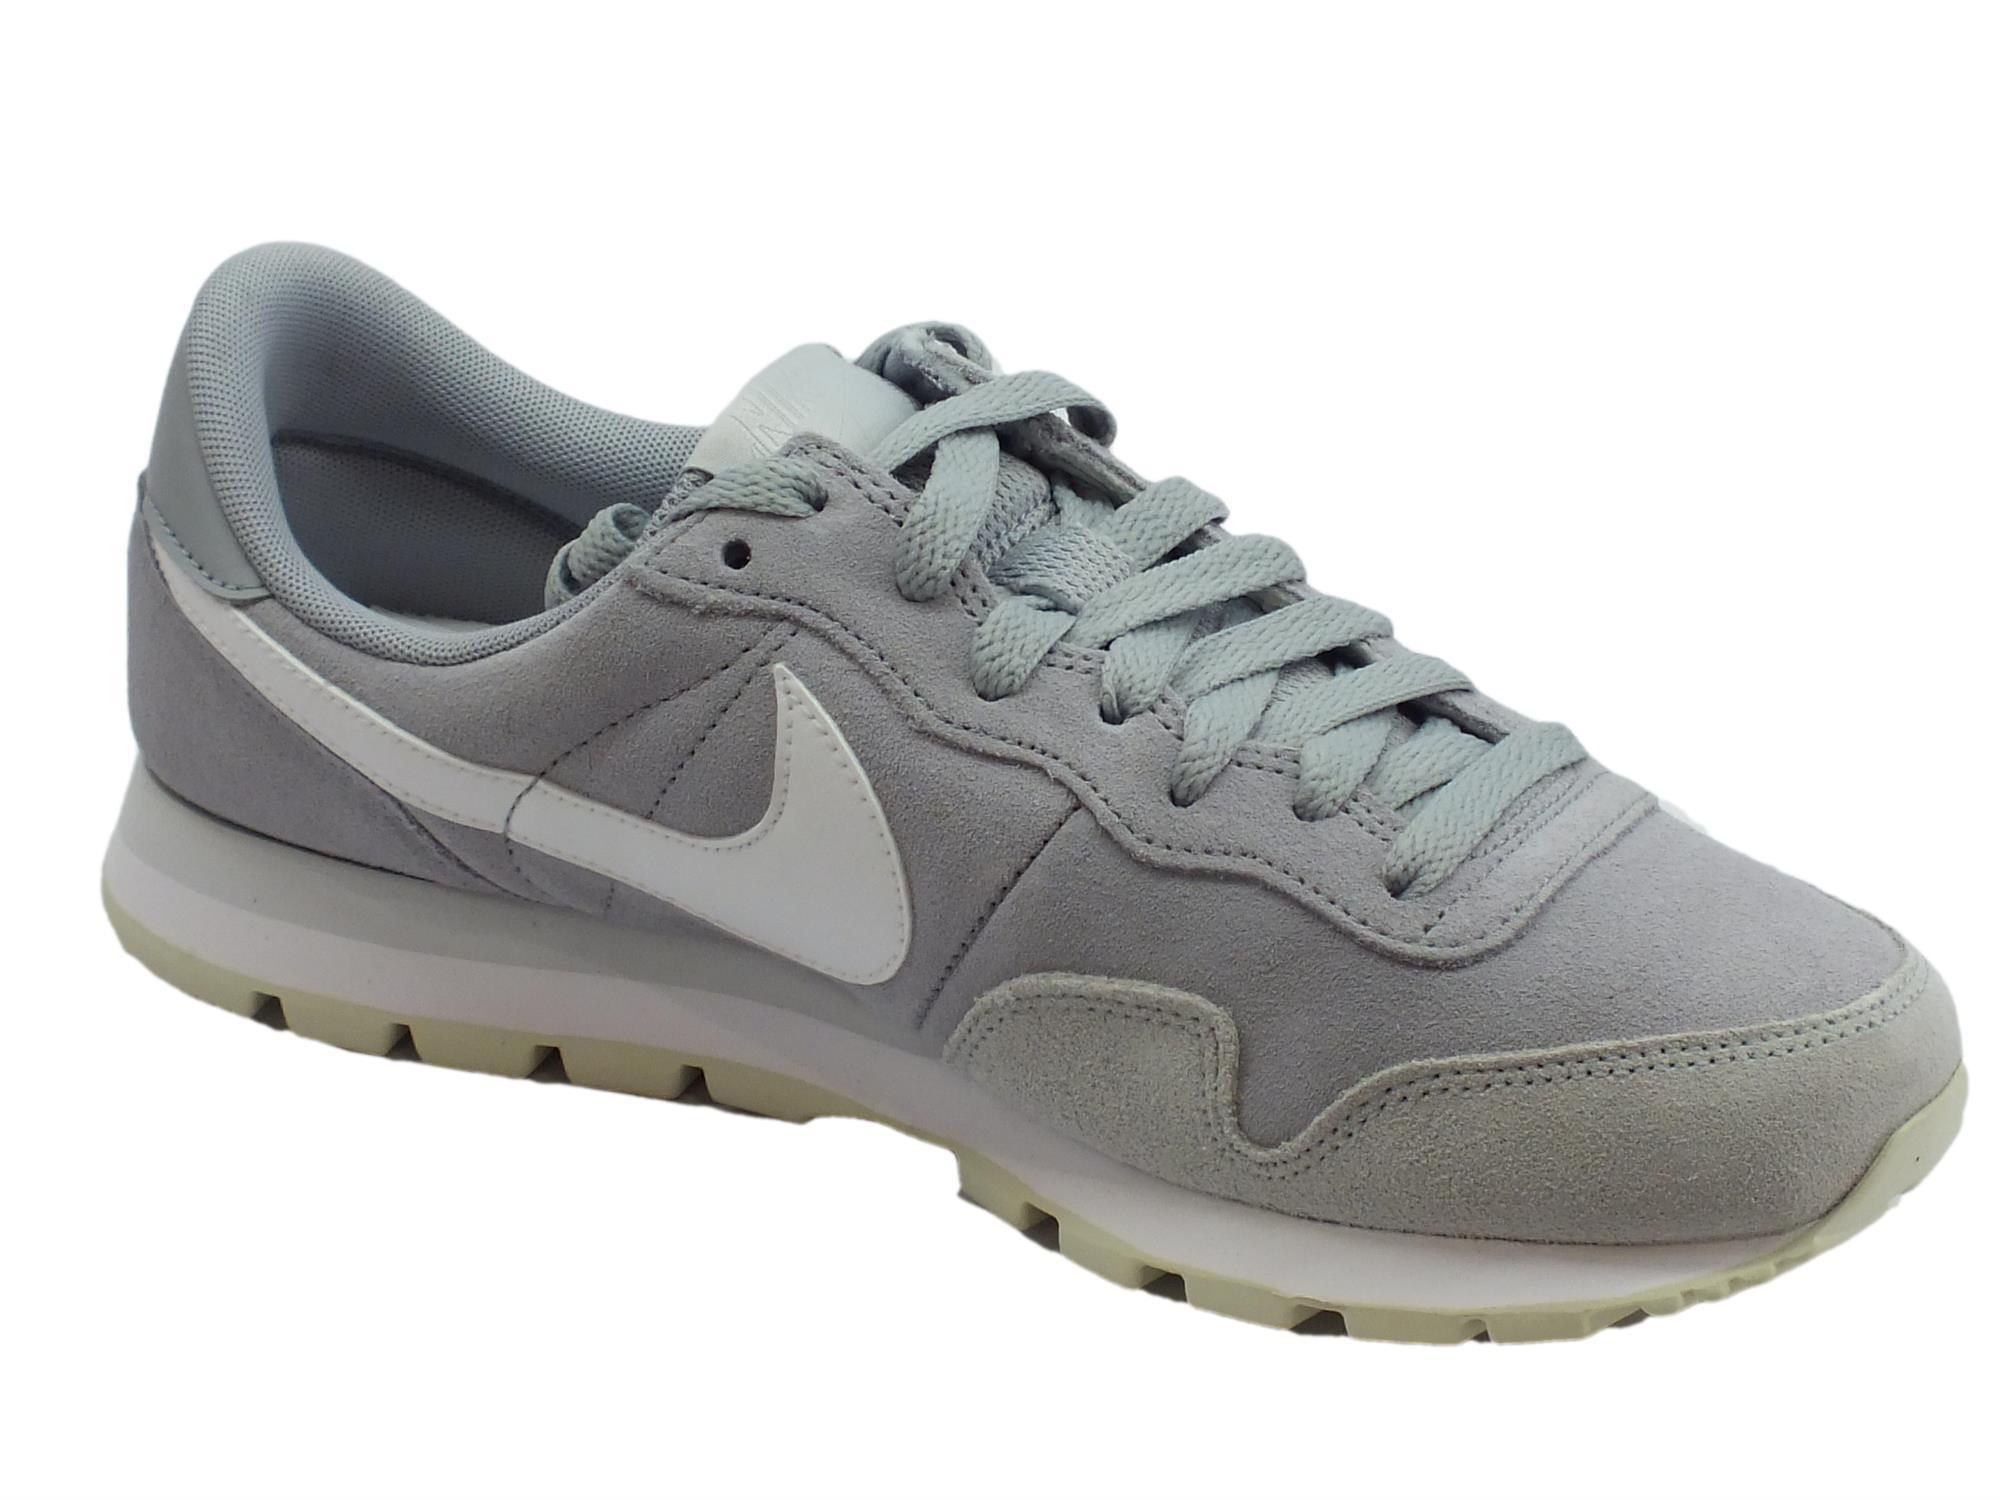 Scarpe sportive per uomo Nike air pegasus in camoscio grigio